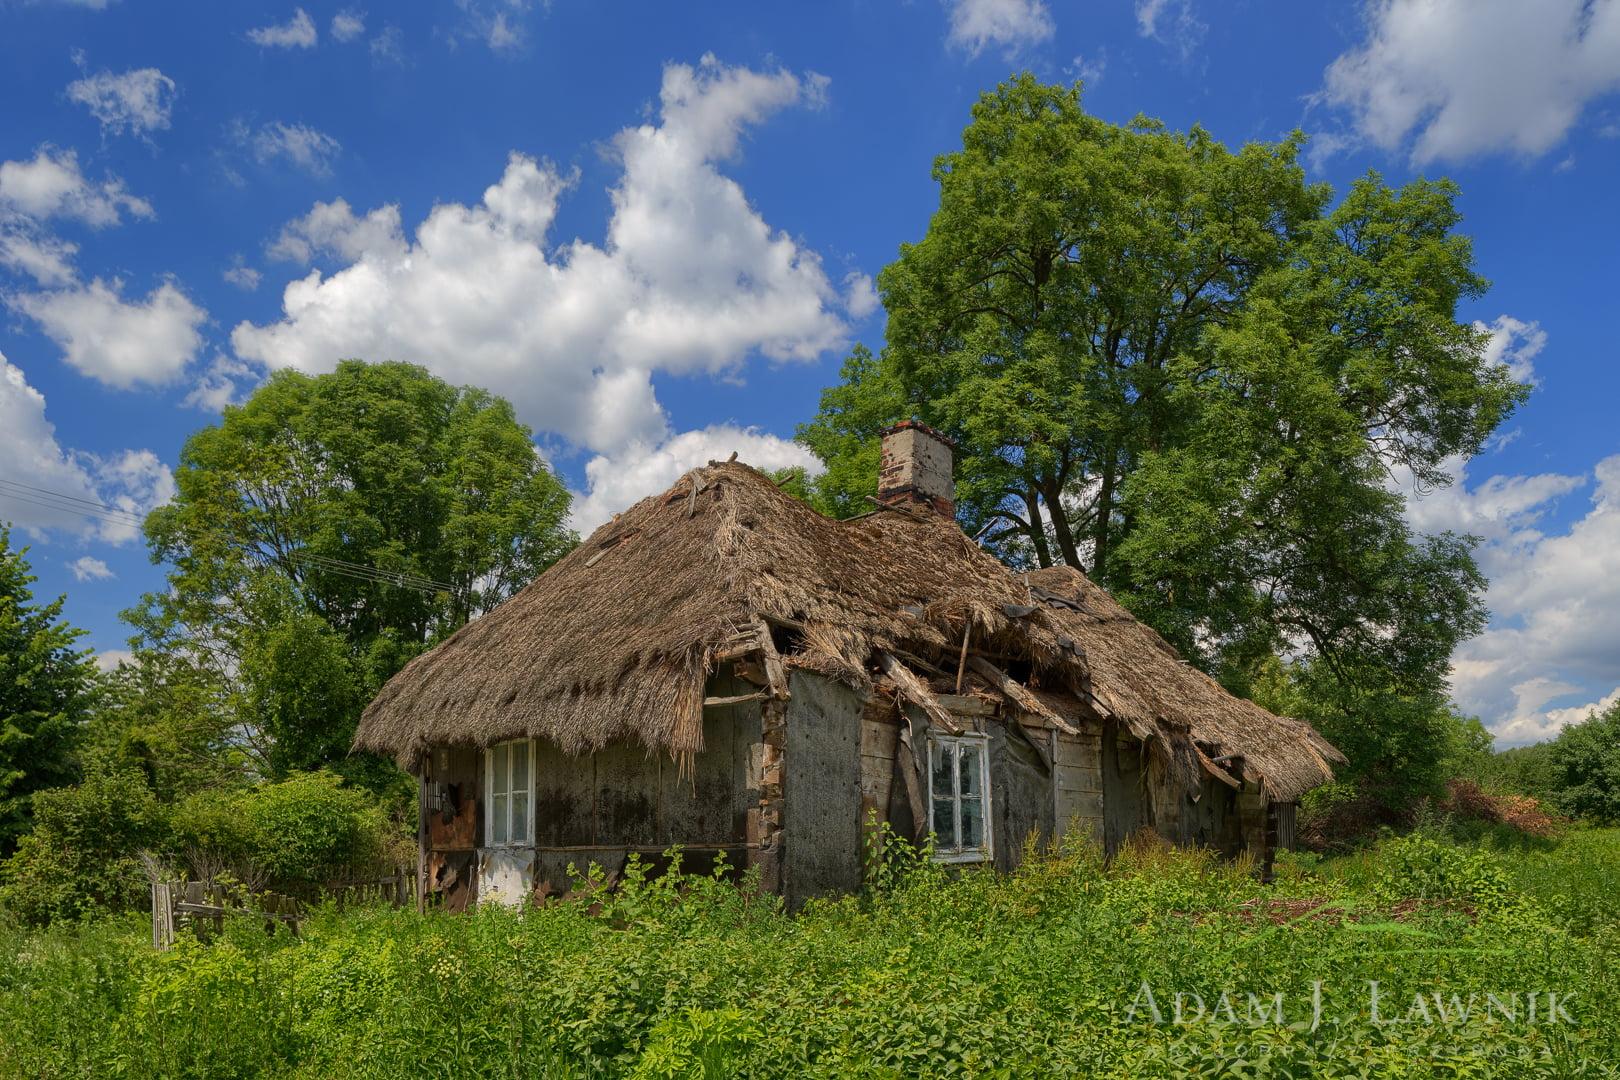 Mazovia, Poland 1607-00794C